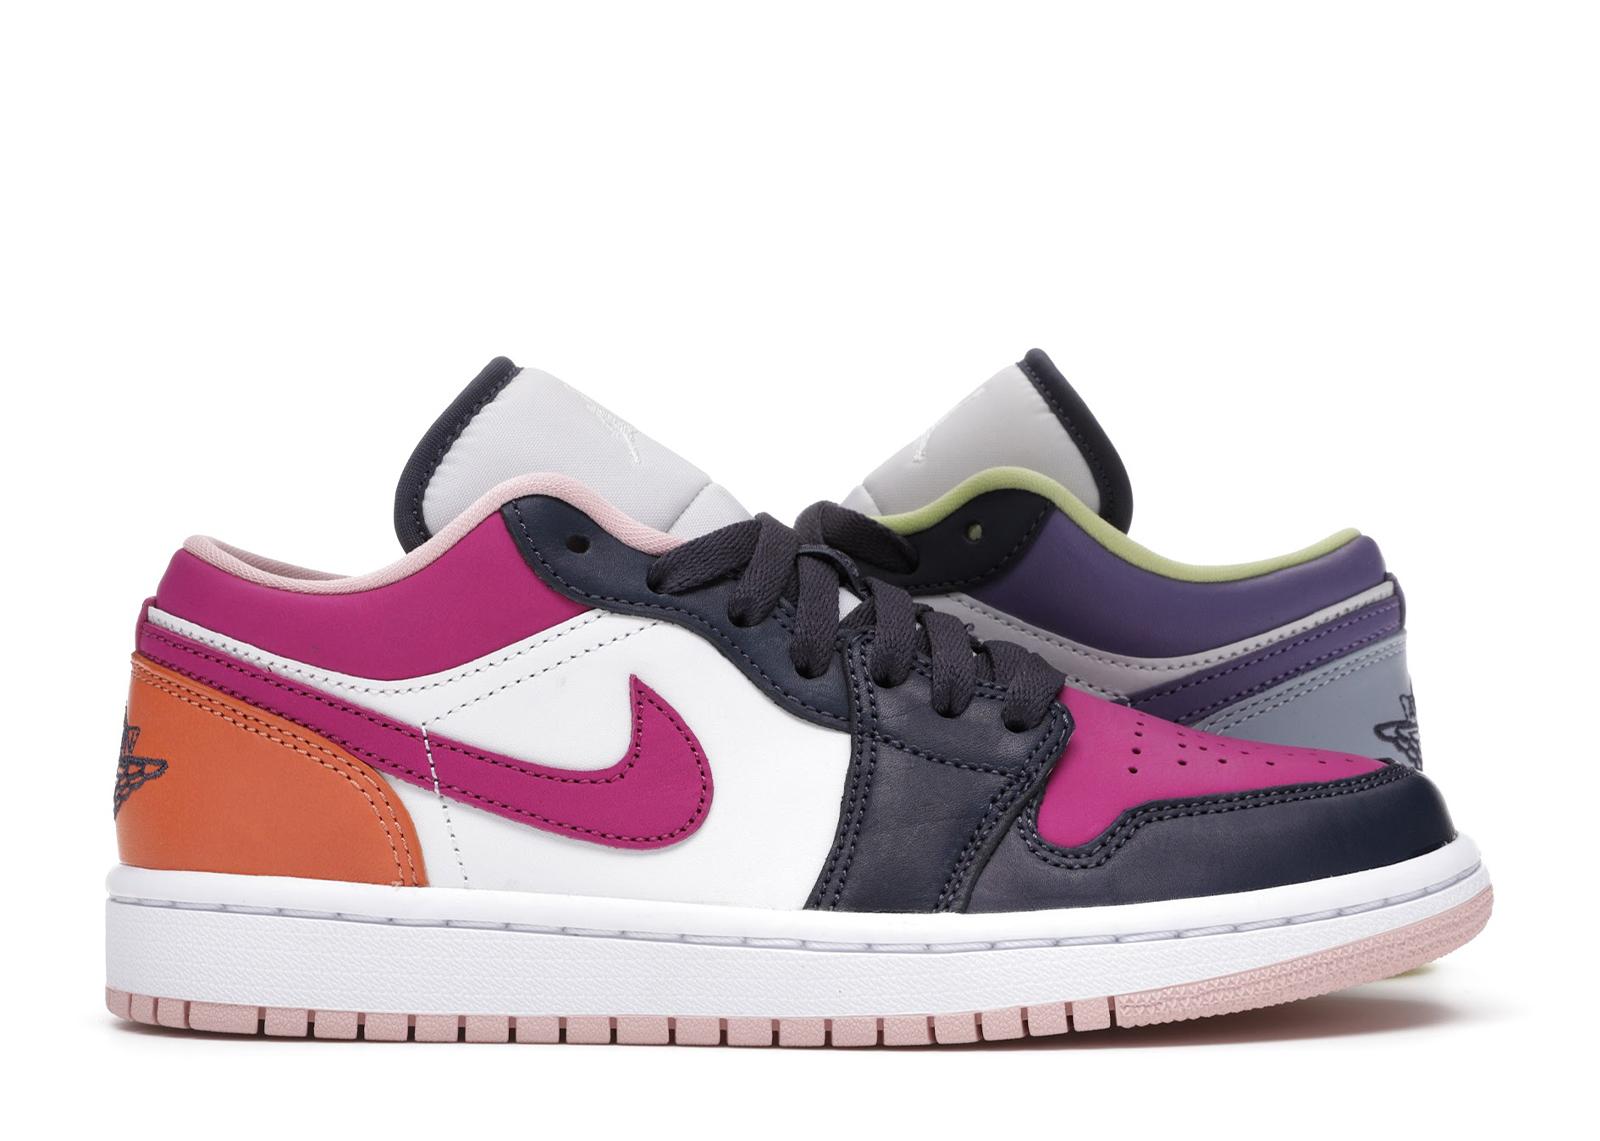 Jordan 1 Low Purple Magenta (W) - DJ4342-400